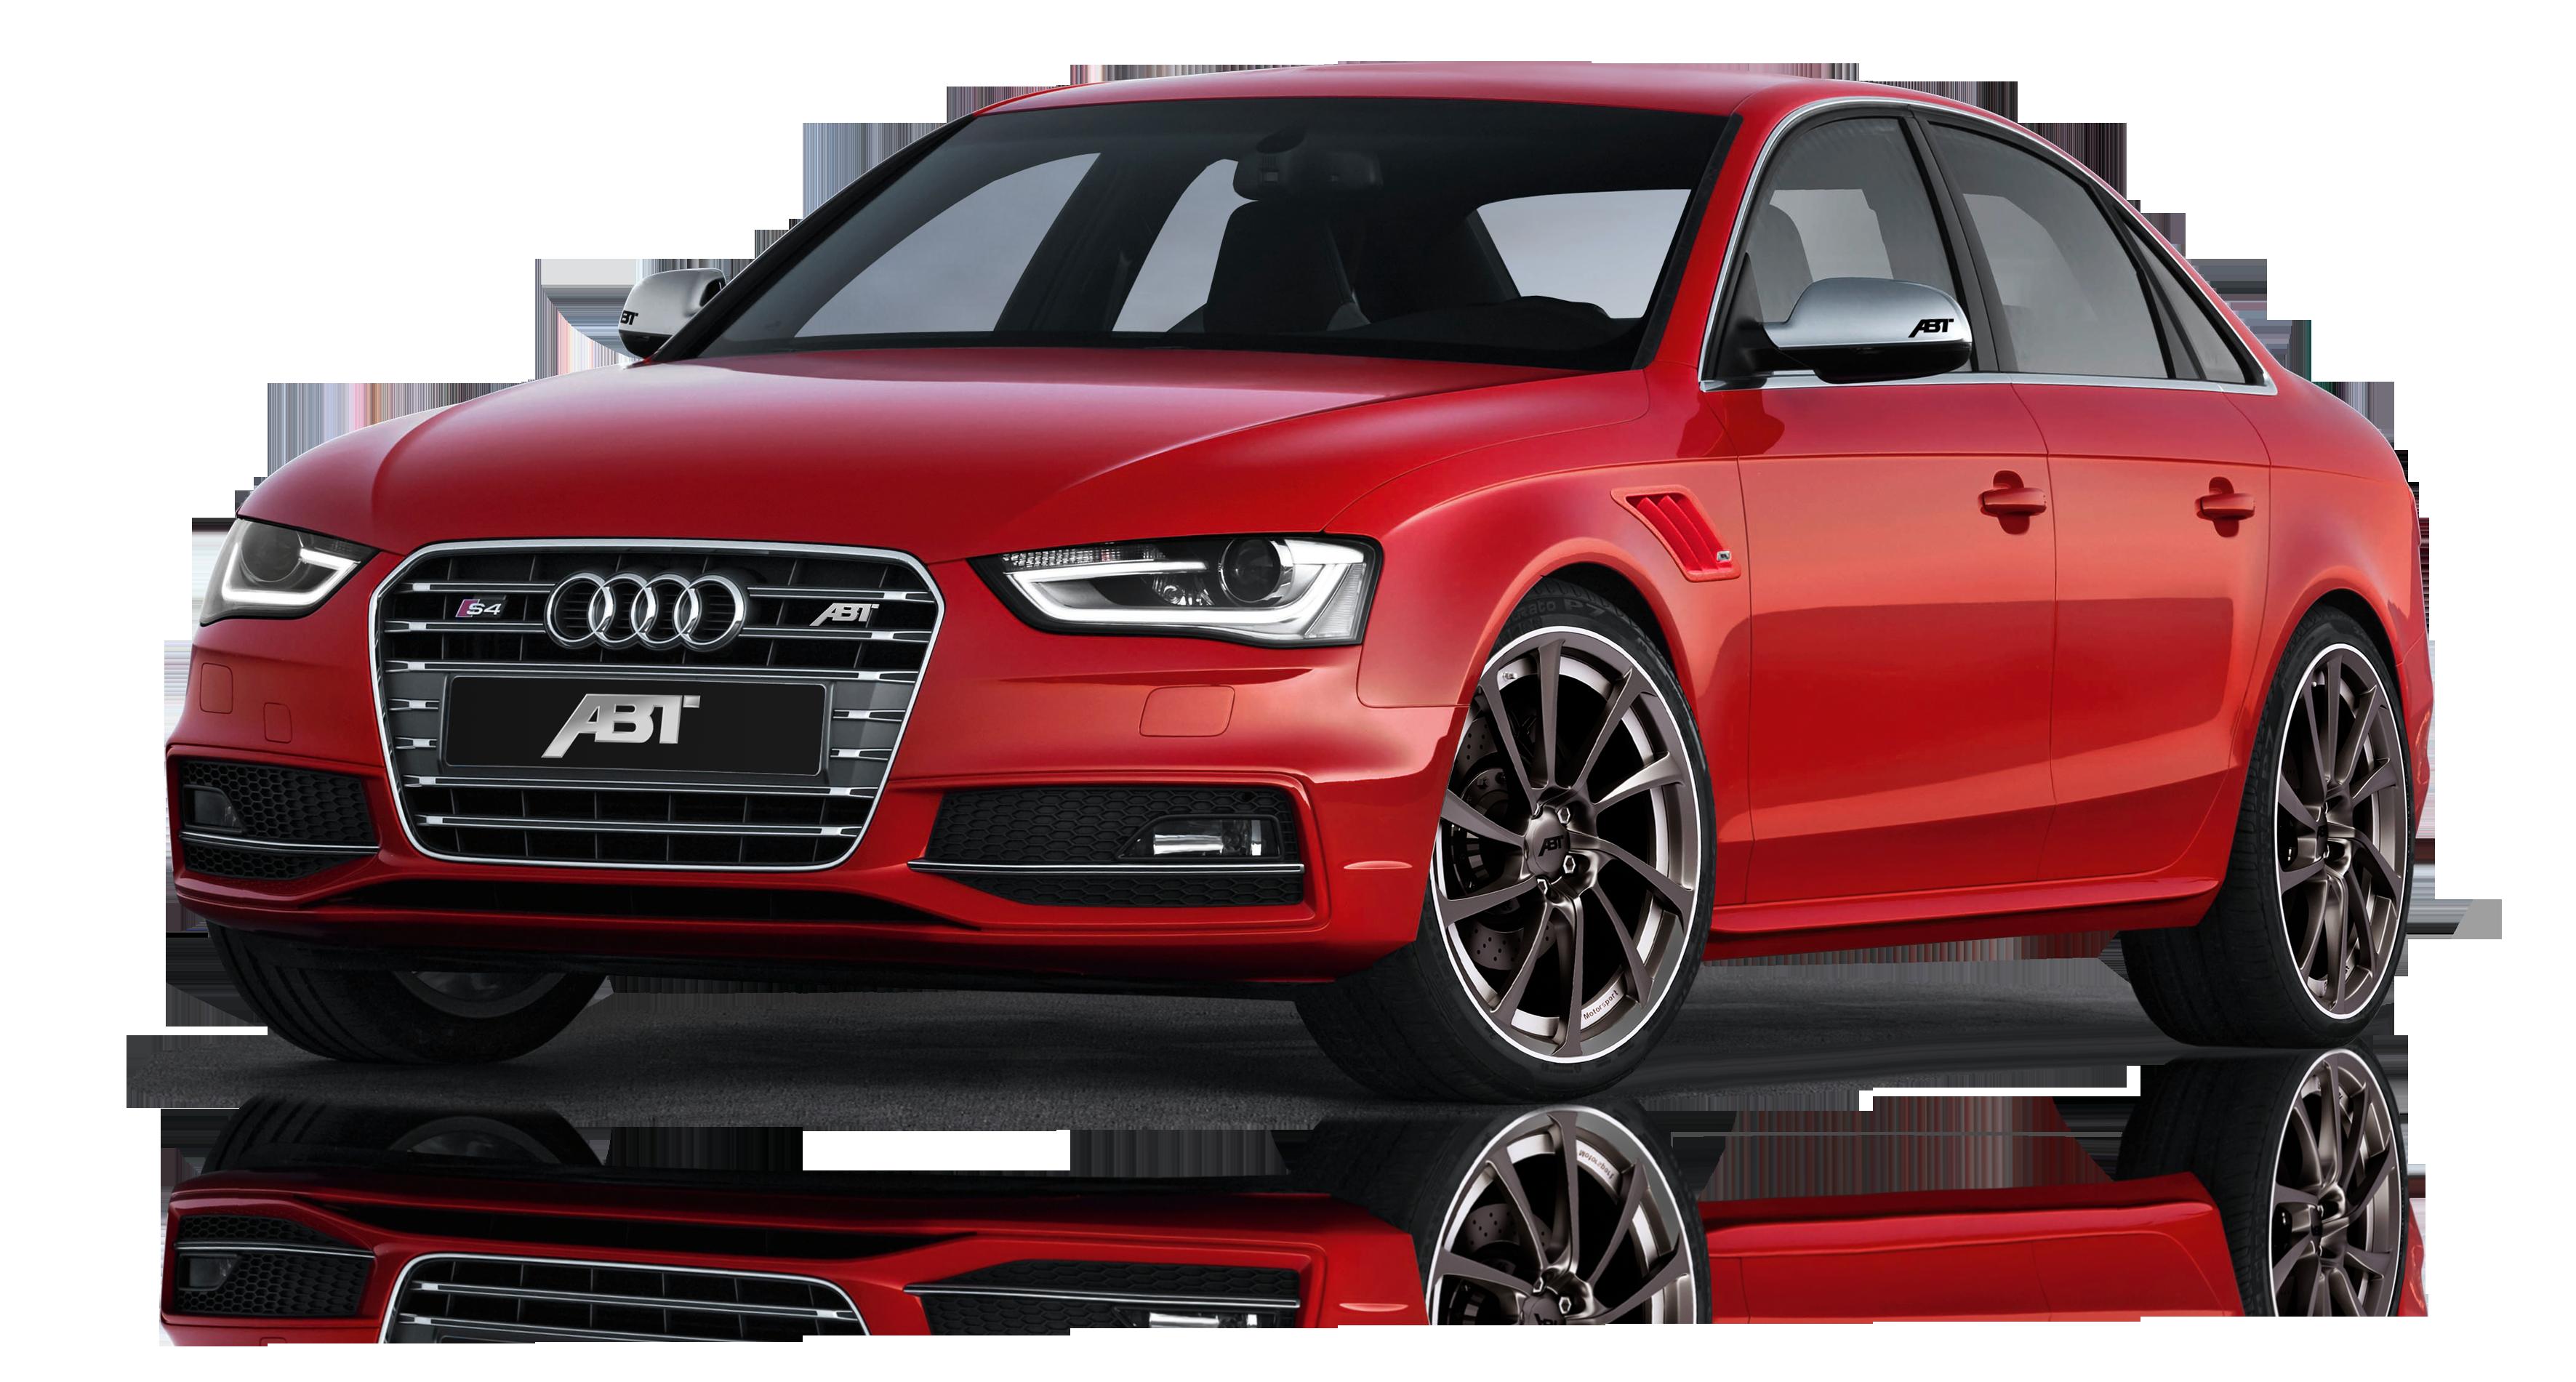 Audi PNG Auto Car Image #16828 - Car PNG